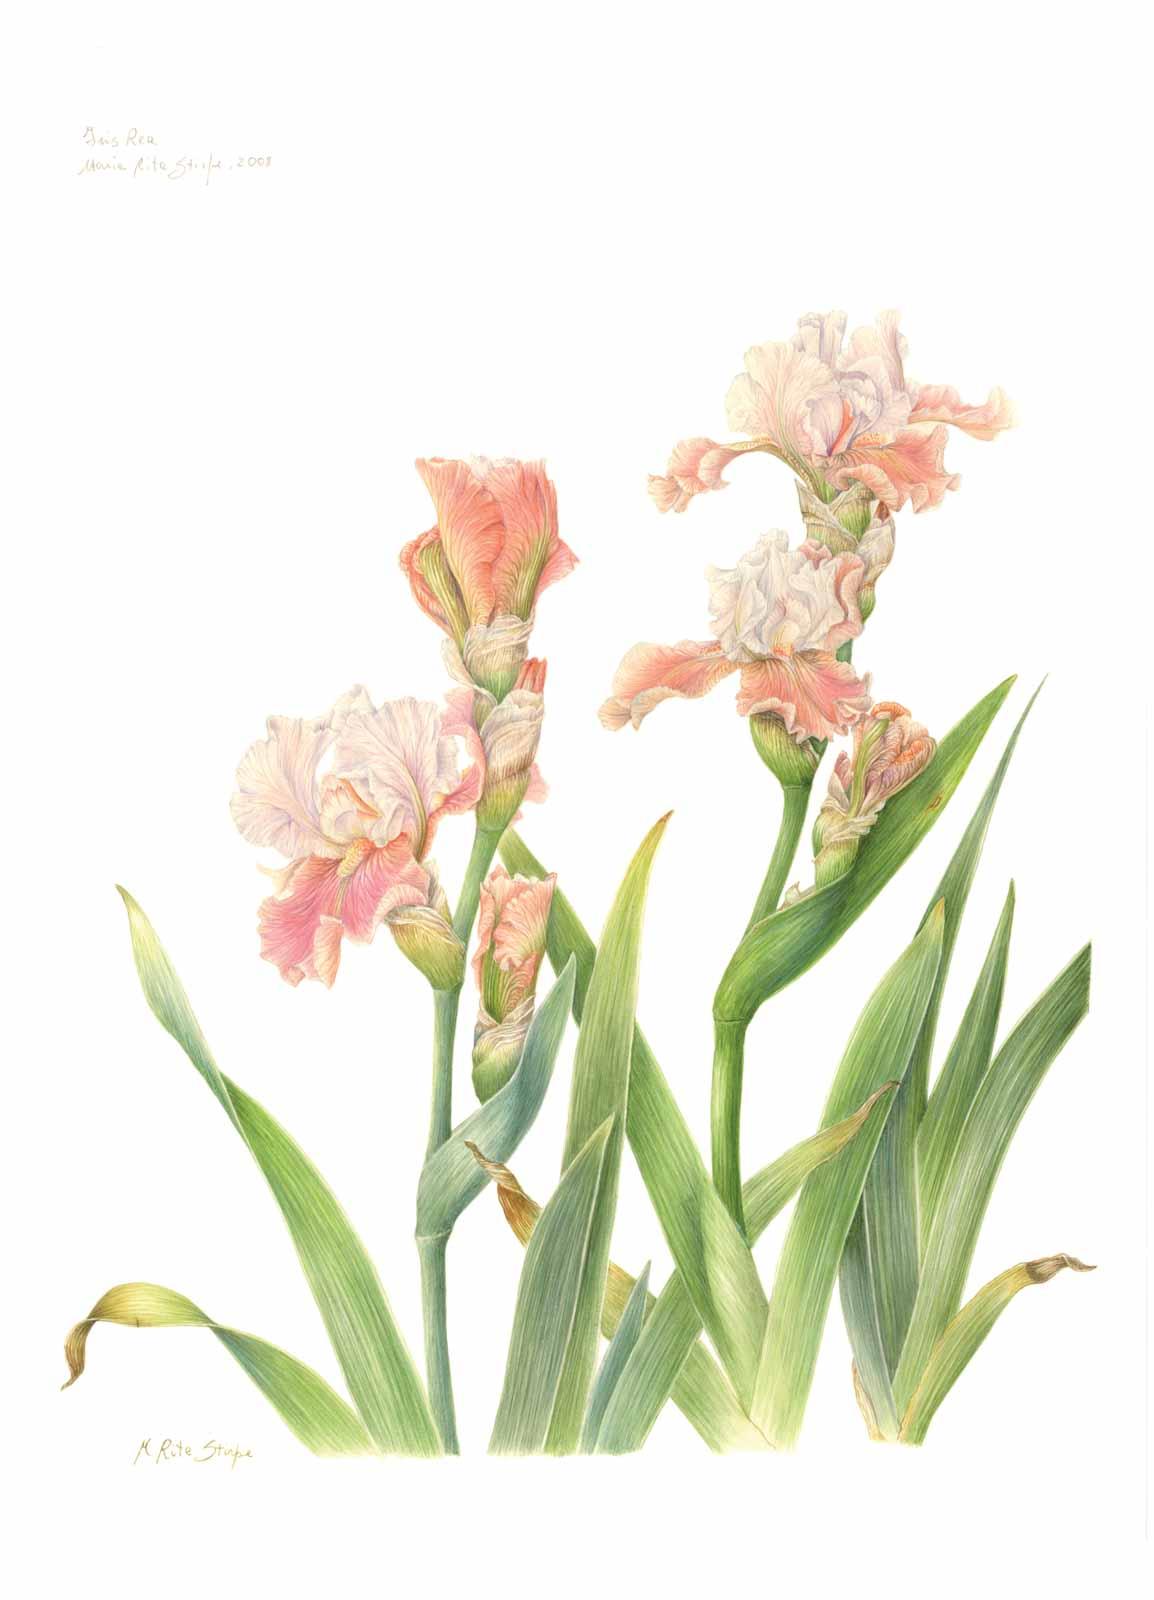 Catalogo - Ars Botanica - Stampa 06